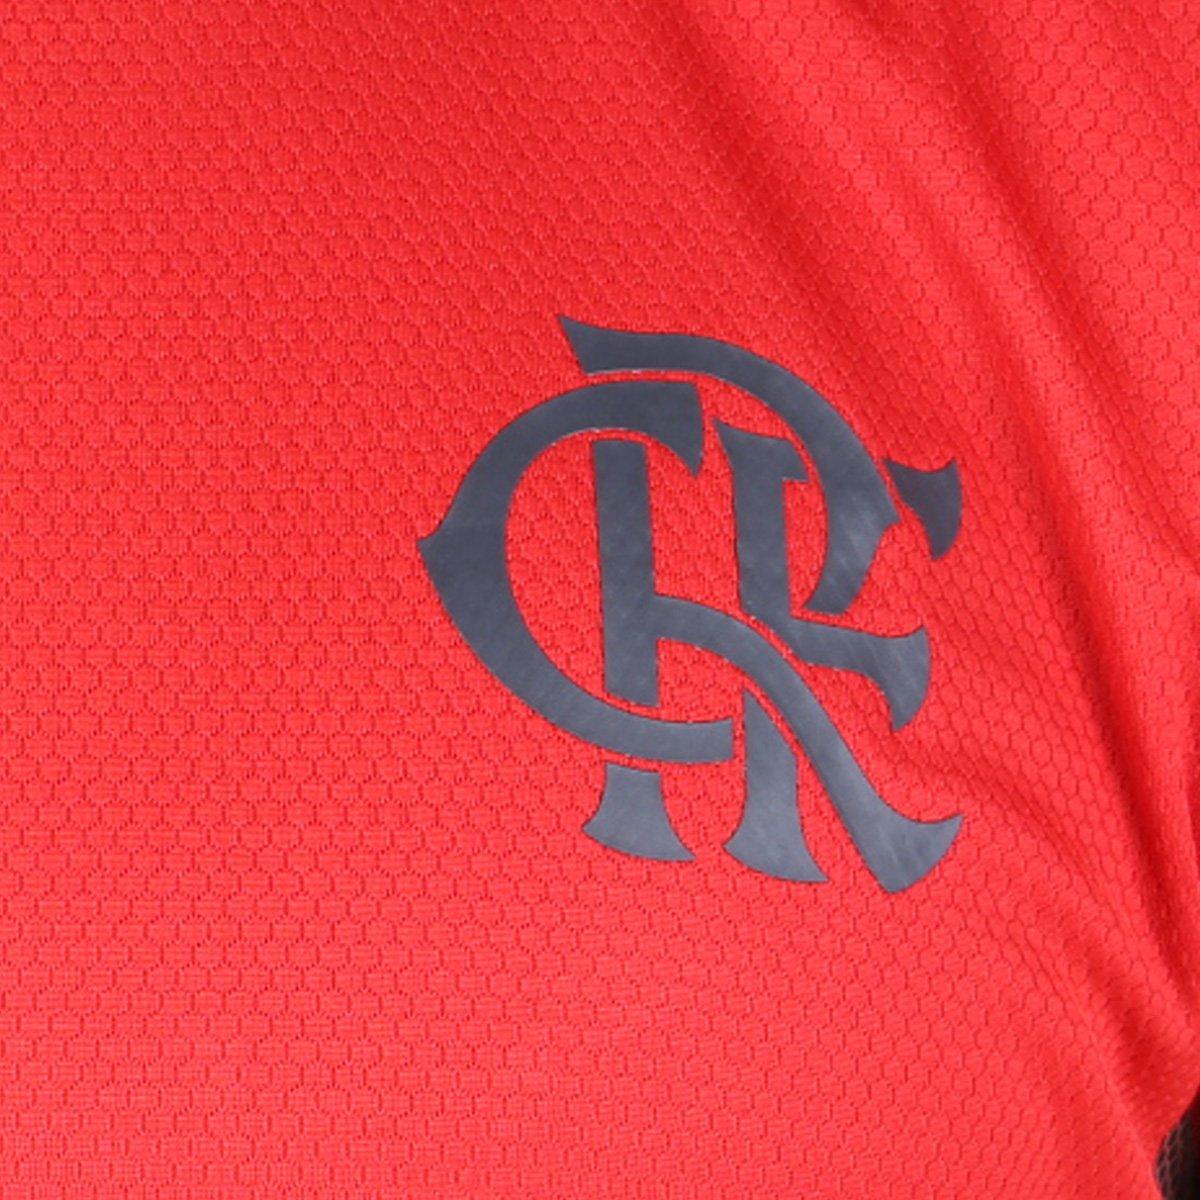 Regata Adidas Treino 21/22 Flamengo